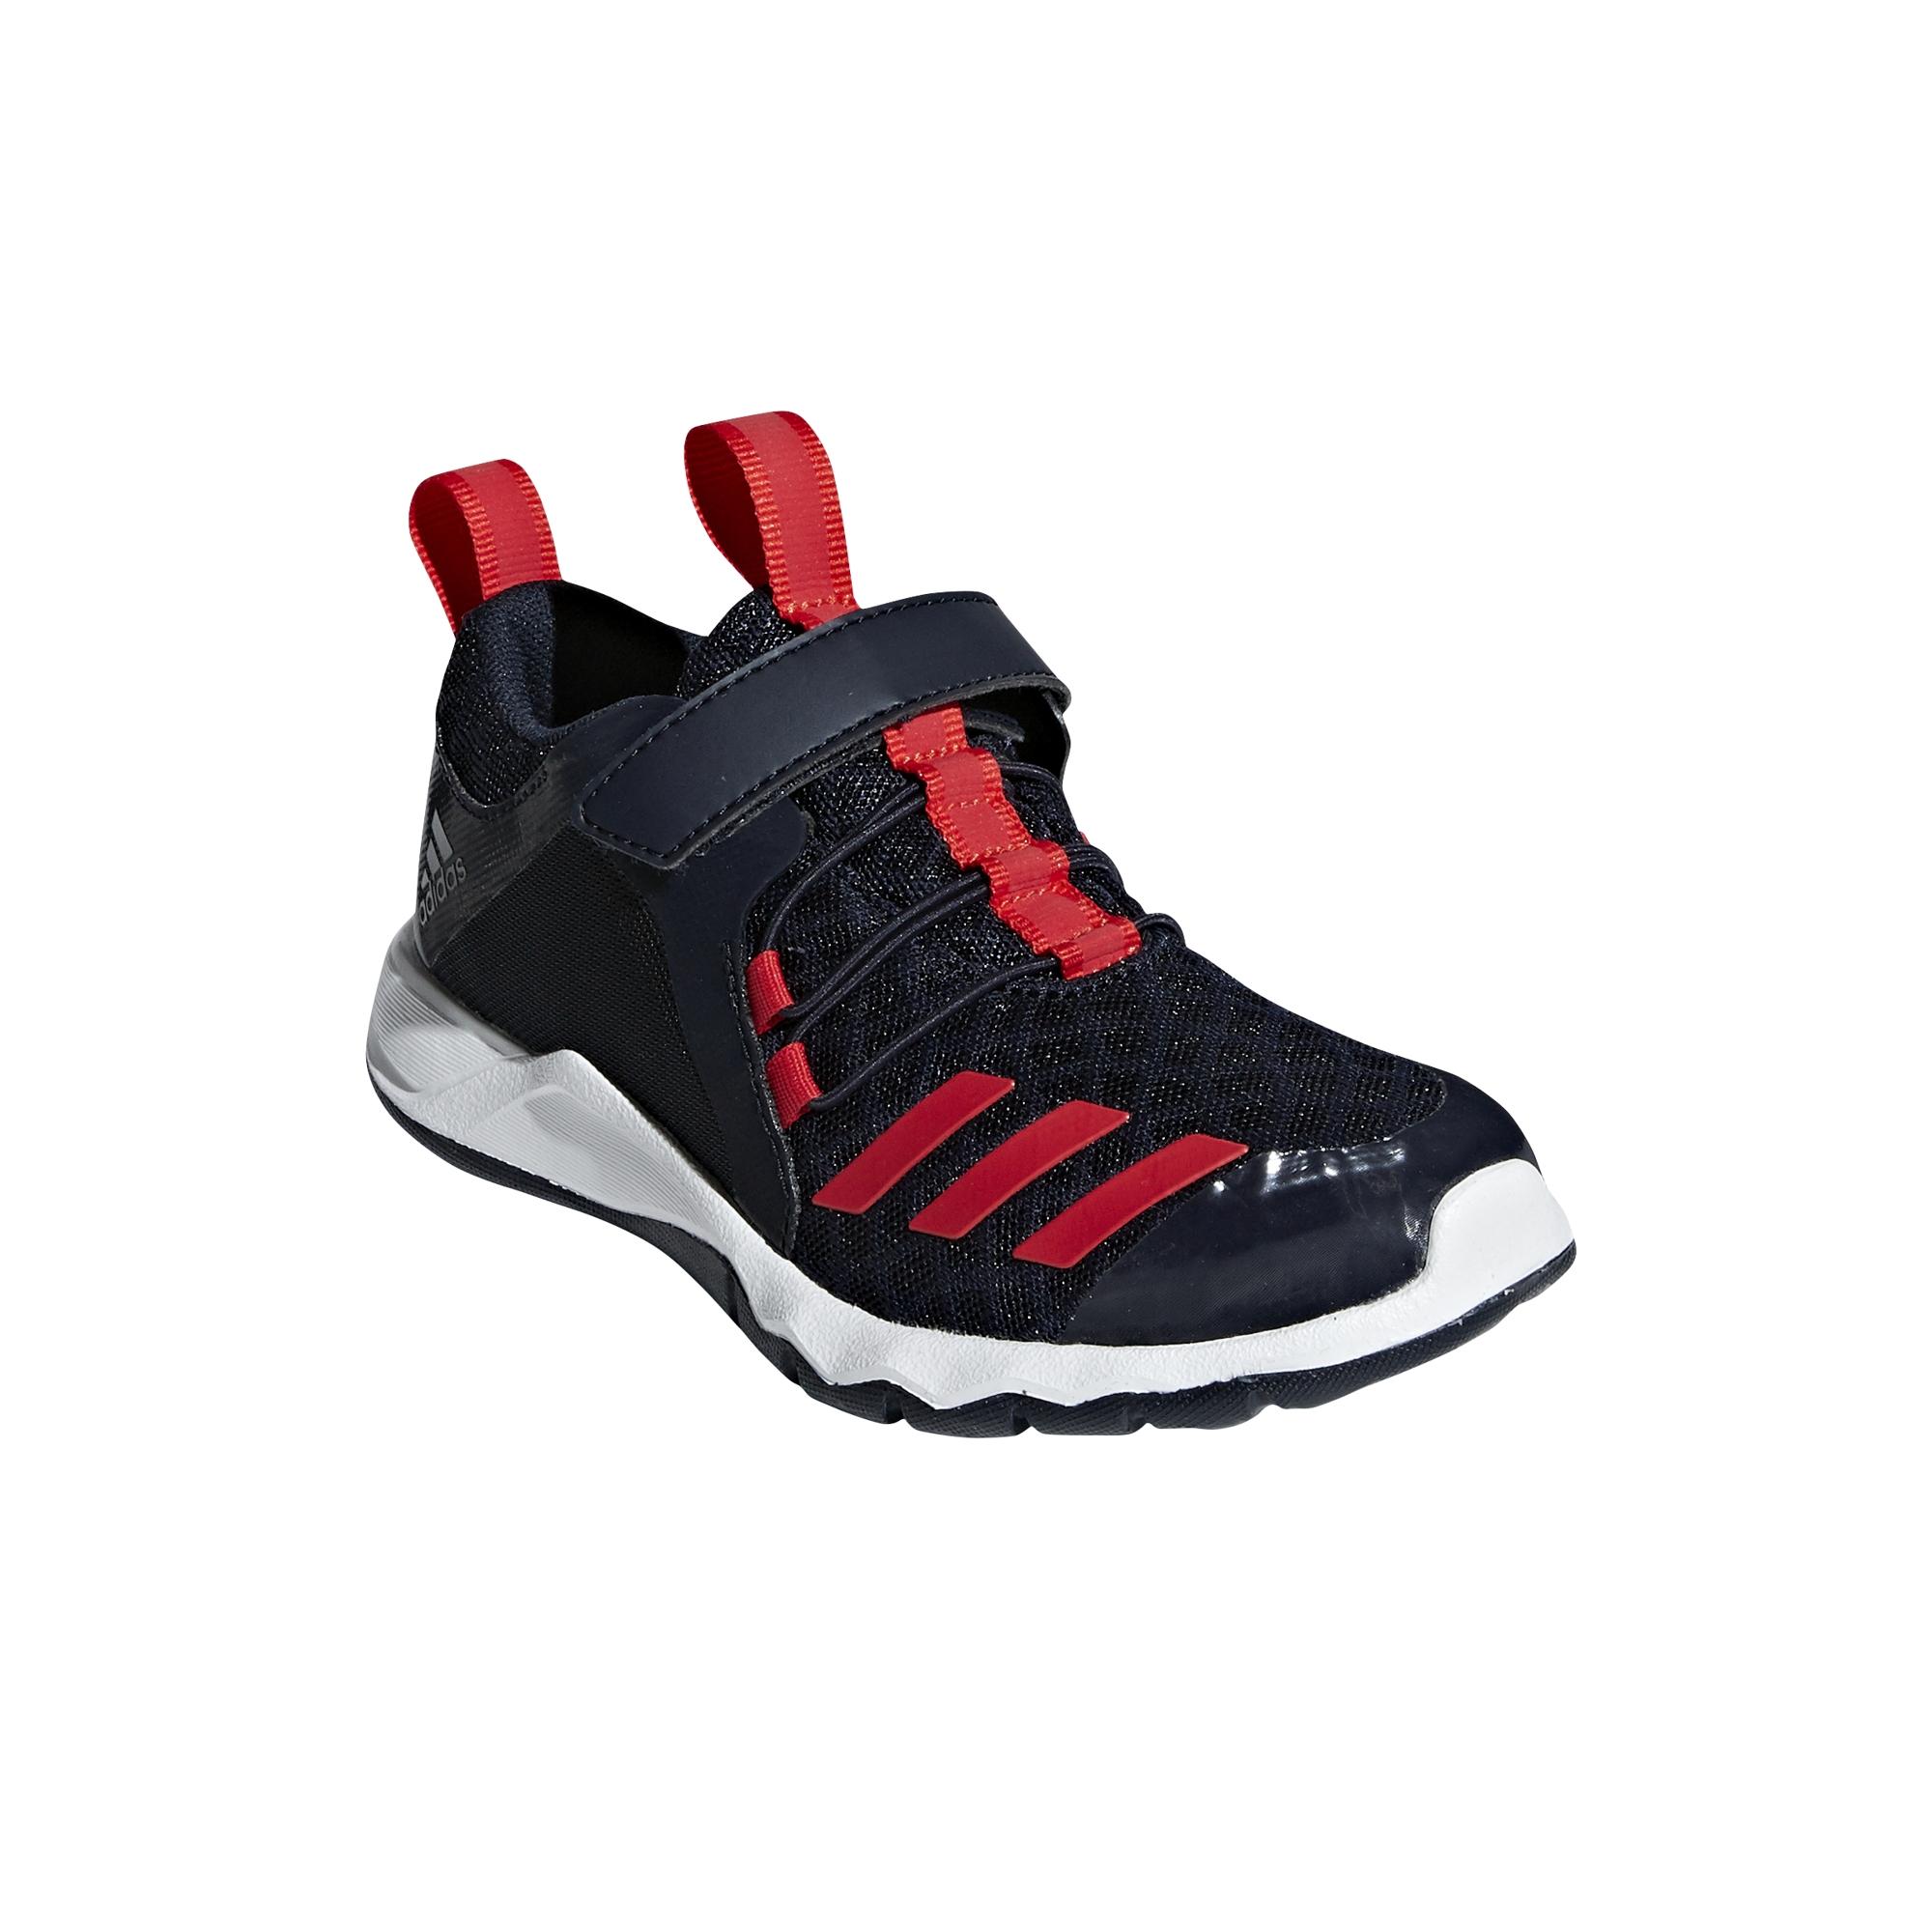 Adidas Kid Rapidaflex Adidas Chaussures Kid Chaussures Rapidaflex On0kX8wP